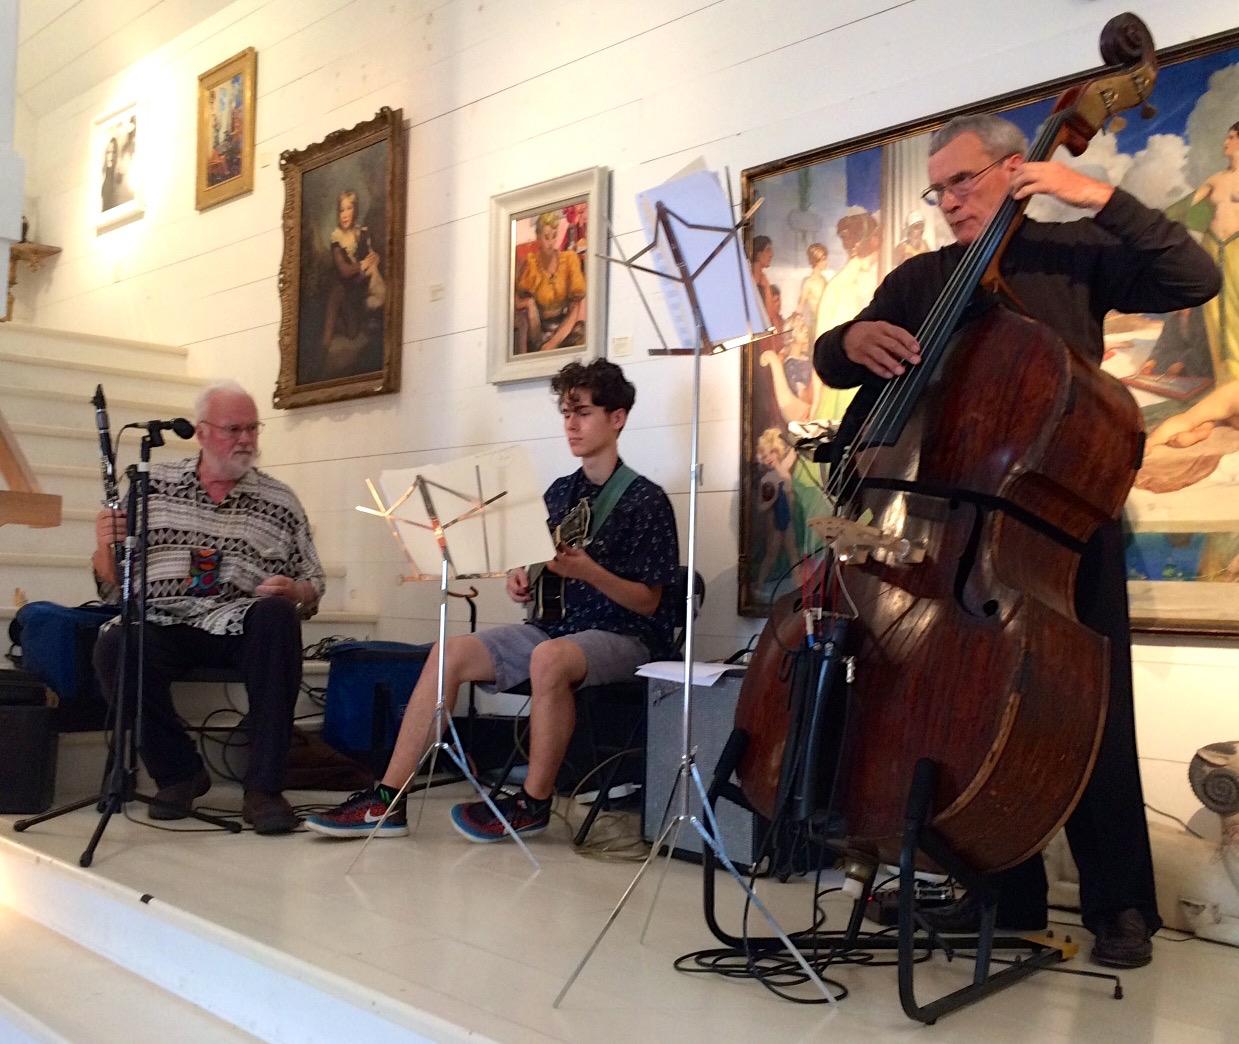 Brad Terry, Asa Waldo, and Vaughn DeForest play in WBG Modern Gallery during the August Wiscasset Art Walk.